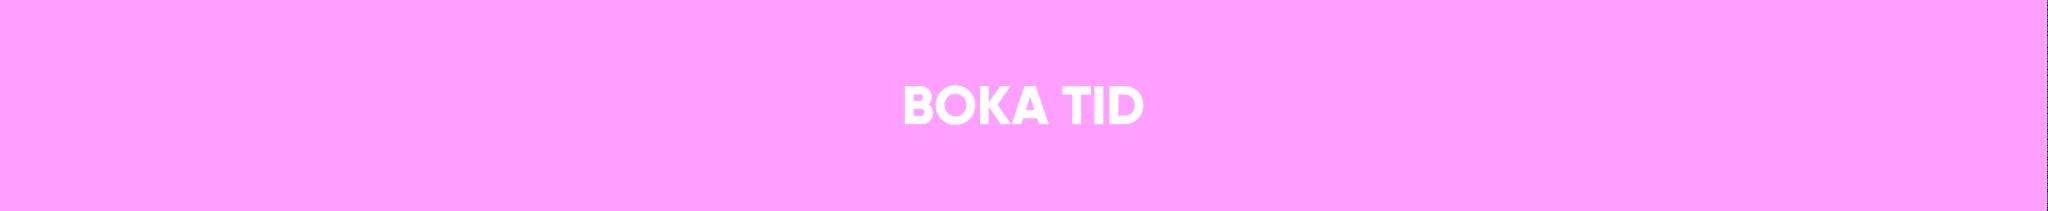 Boka en PR-analys